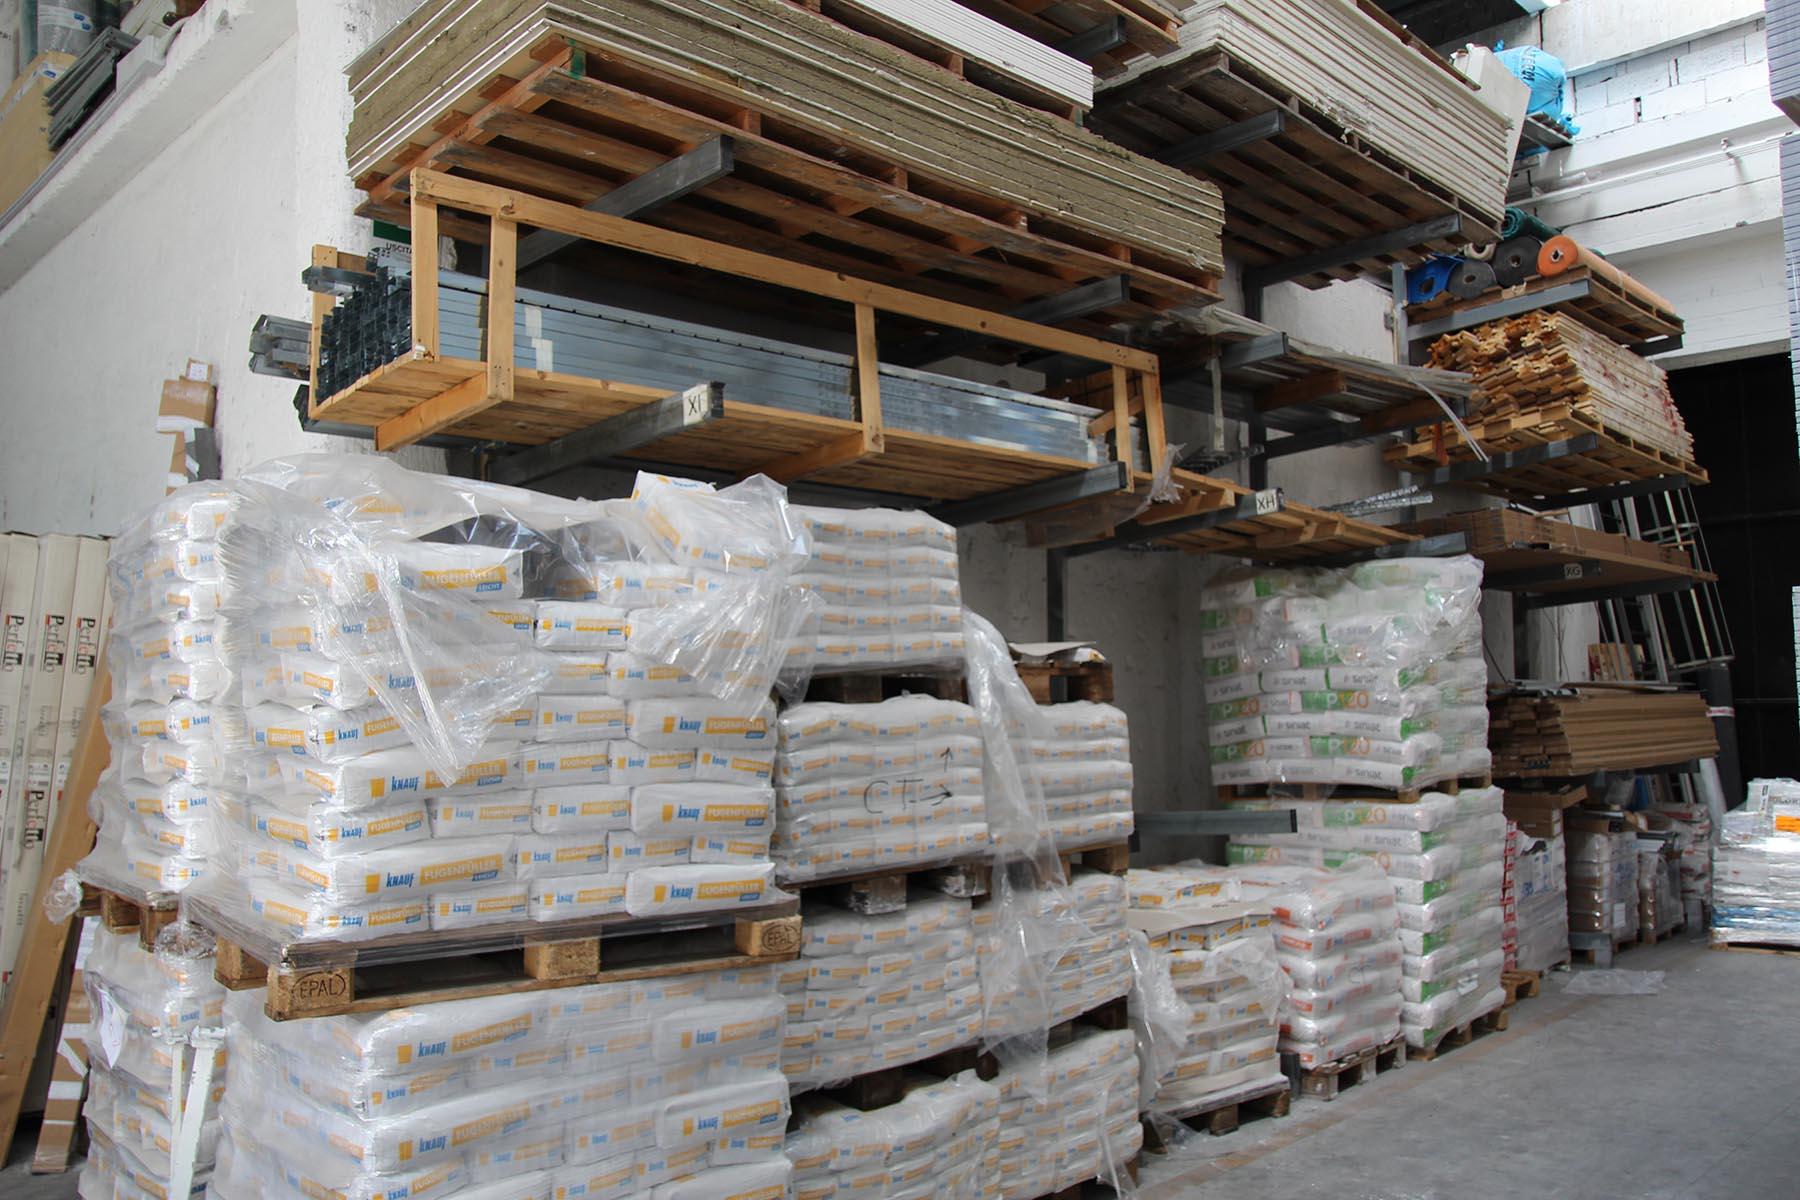 materiale per l'edilizia